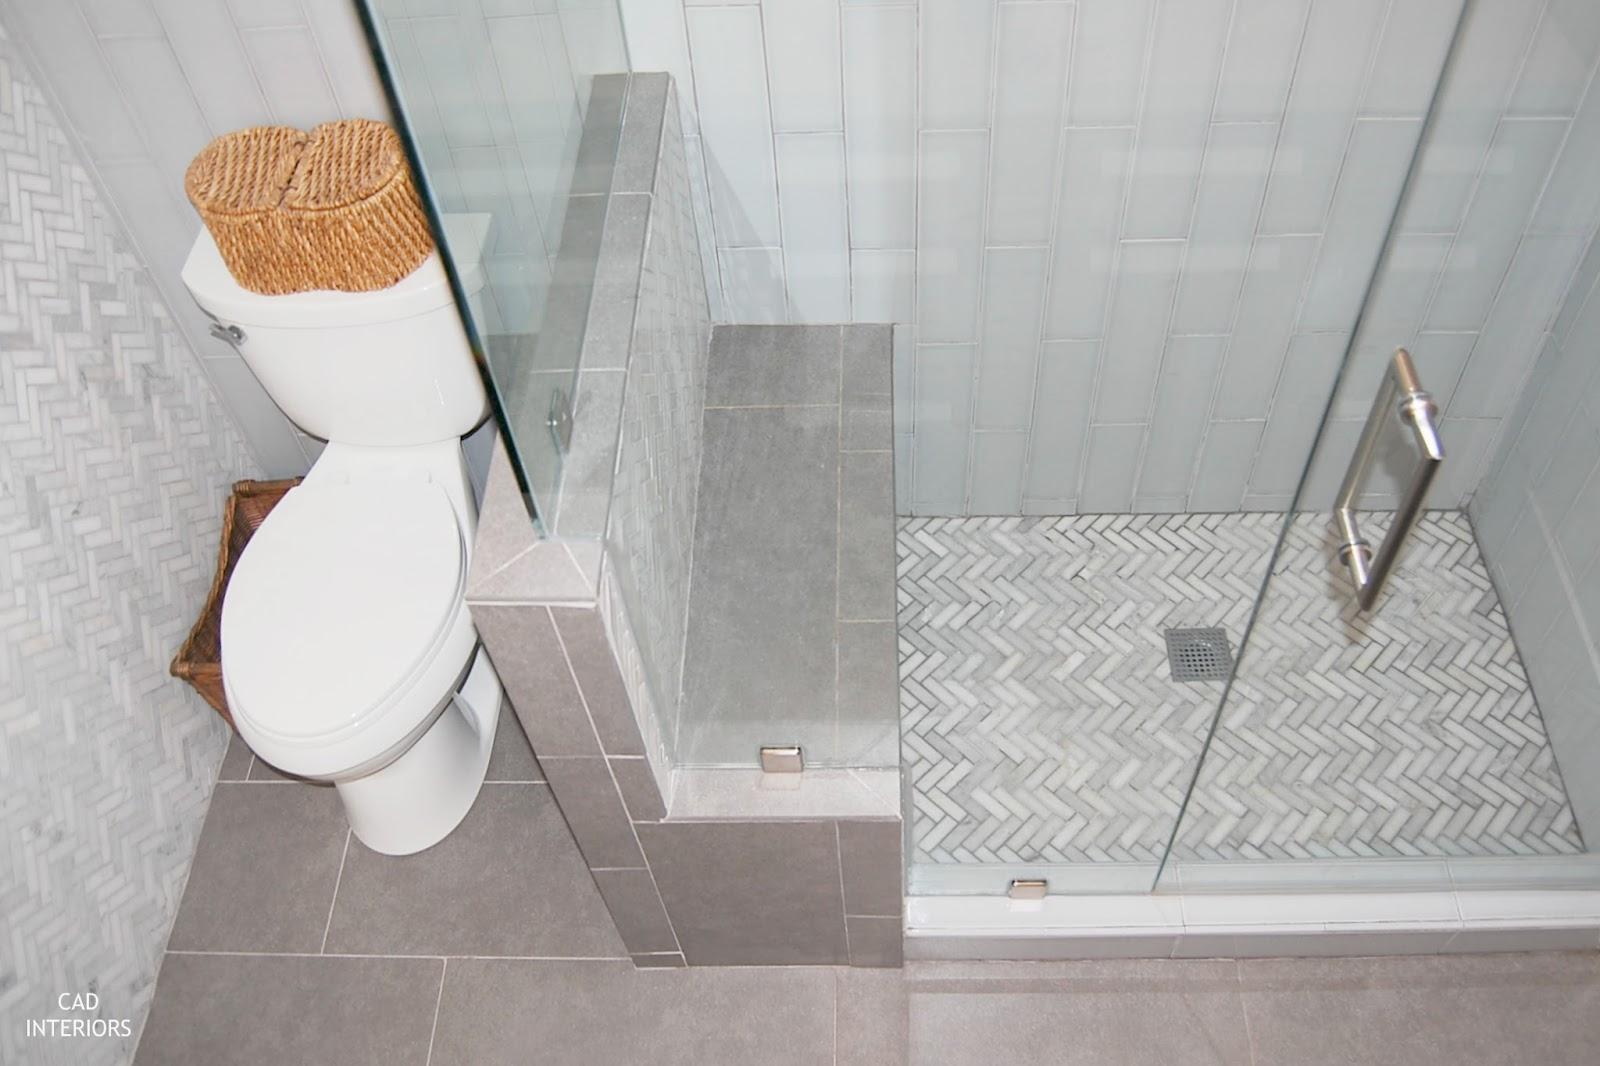 Easy Bathroom Ideas Concealed Cisterns - Plumbing Connection - iteg.biz